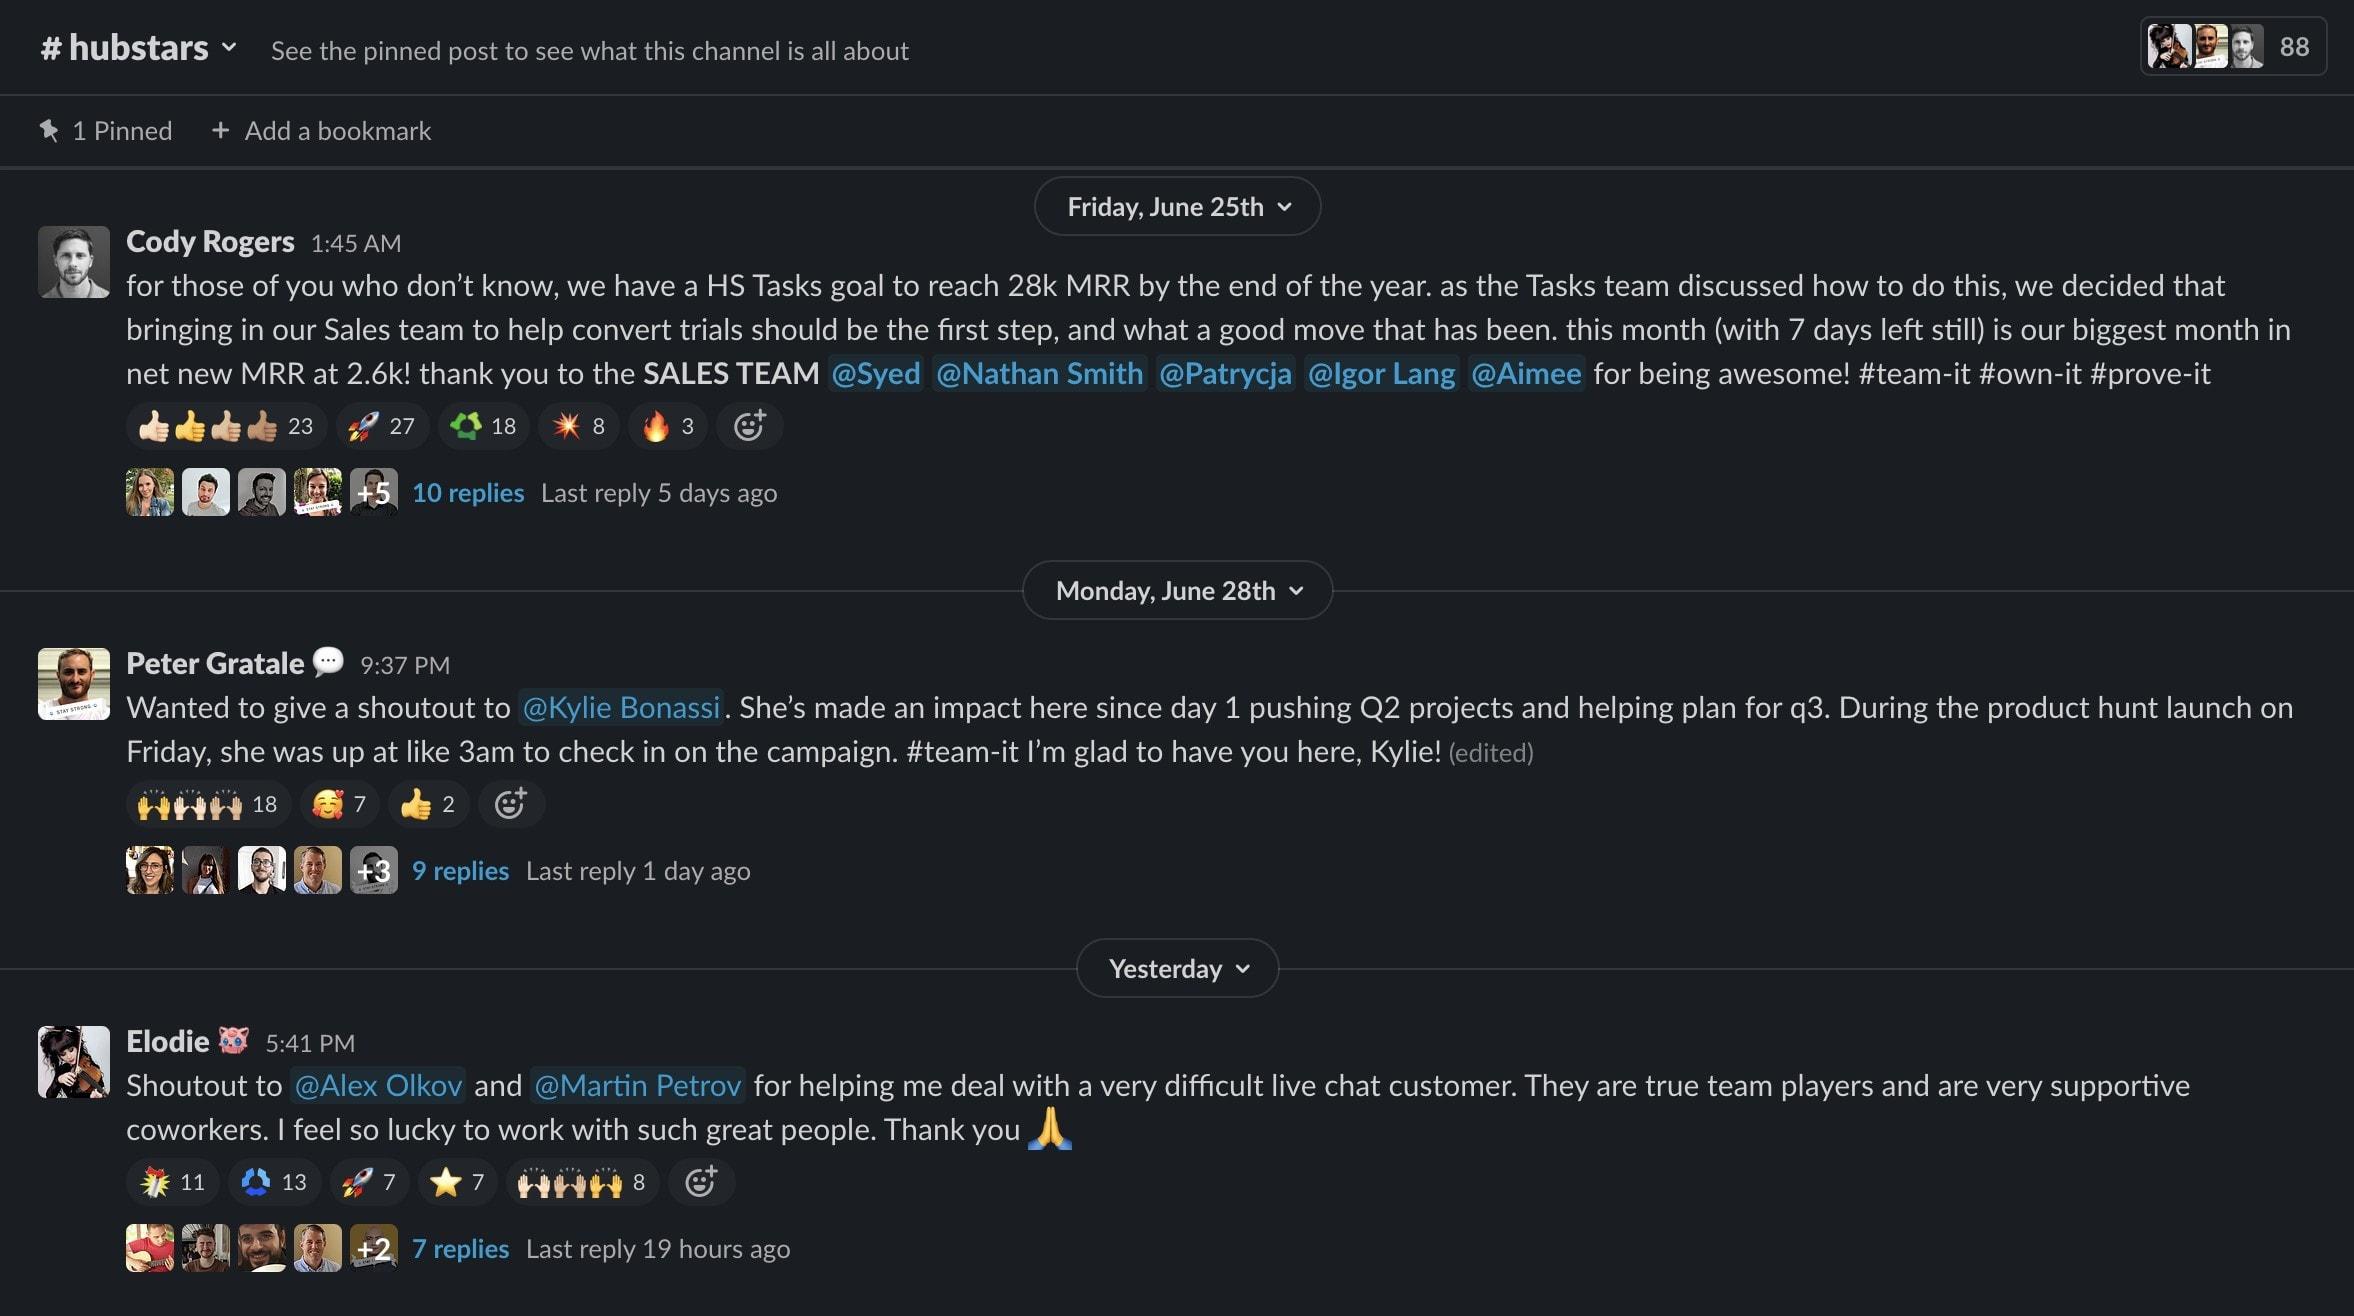 Hubstaff's #hubstars Slack channel